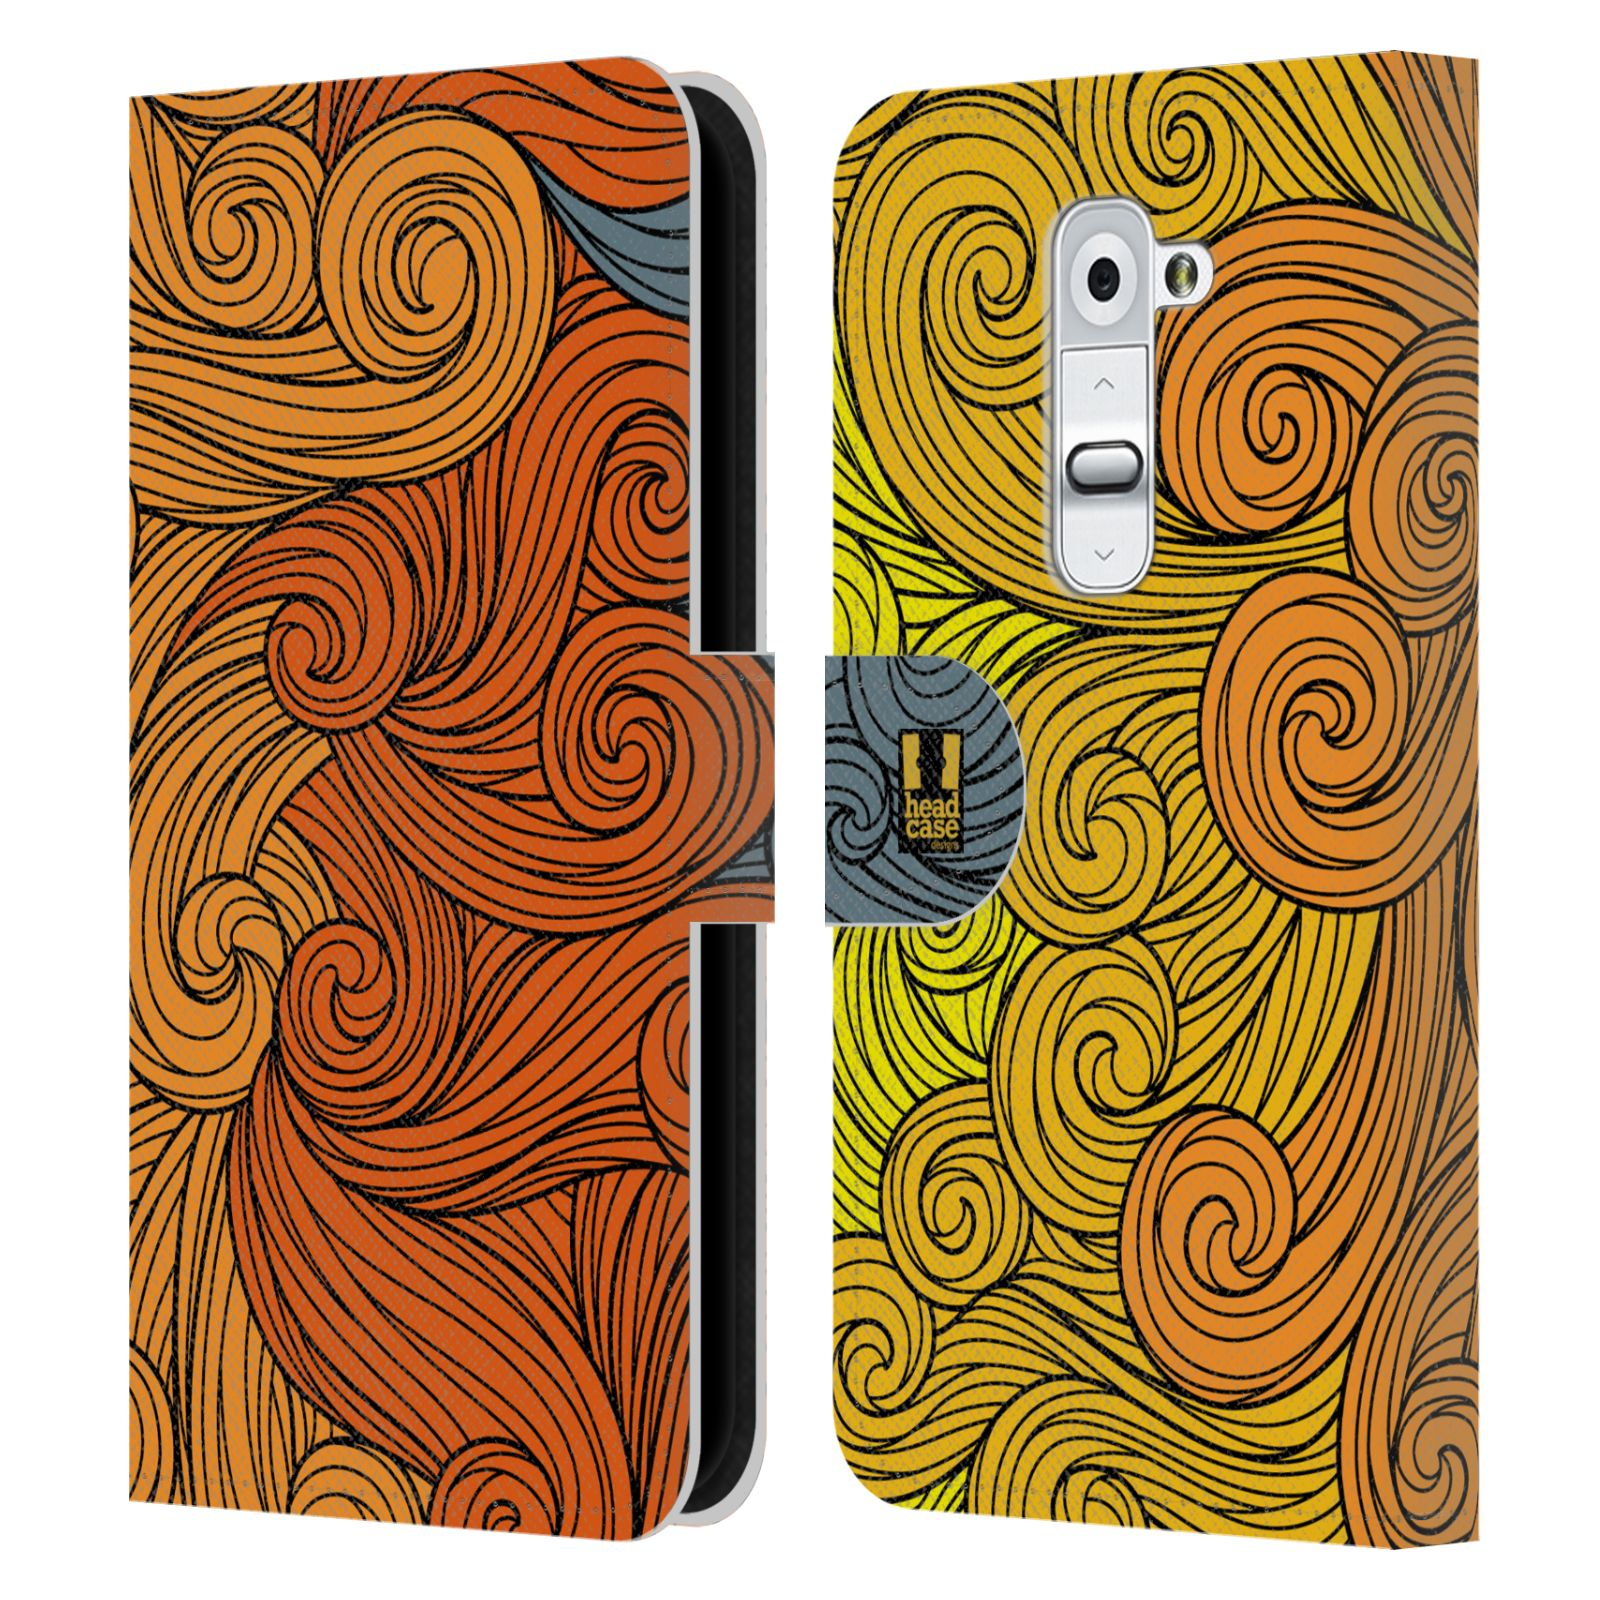 HEAD CASE Flipové pouzdro pro mobil LG G2 (D802) barevné vlny žlutá a oranžová